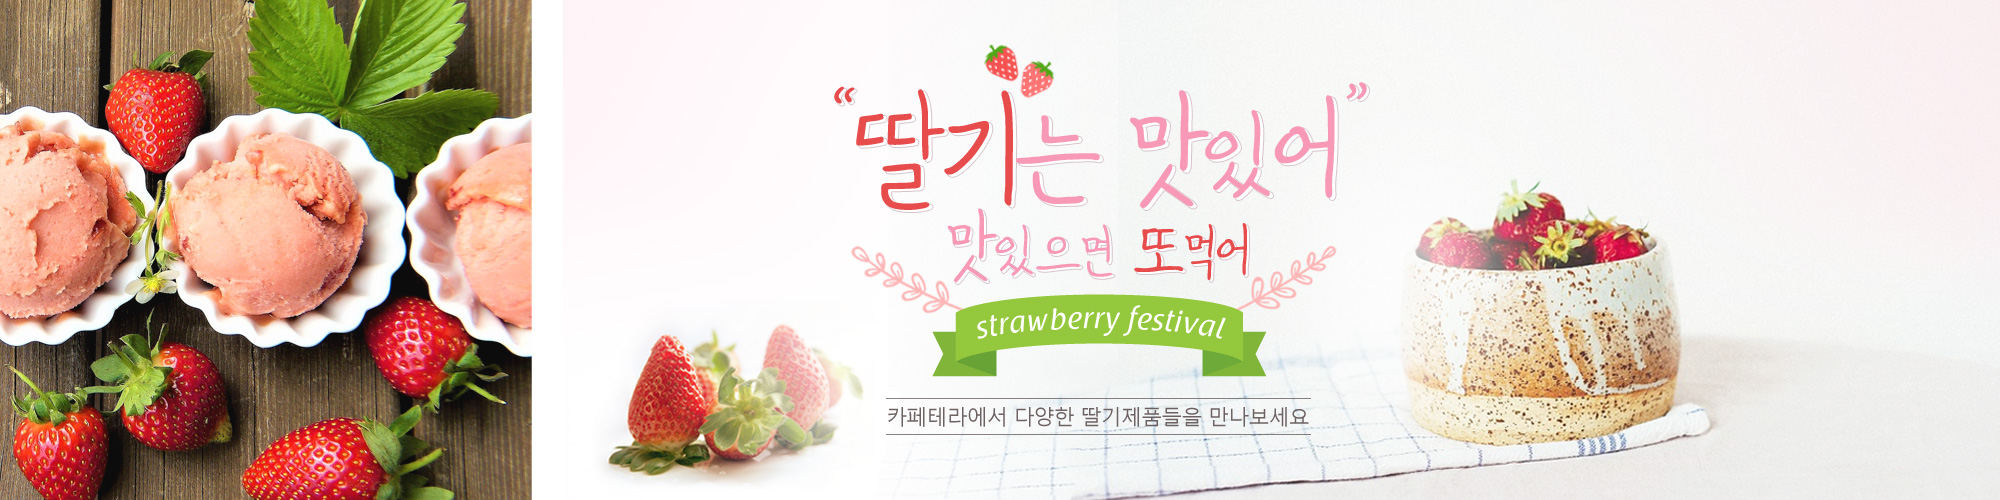 Strawberry2019_2000